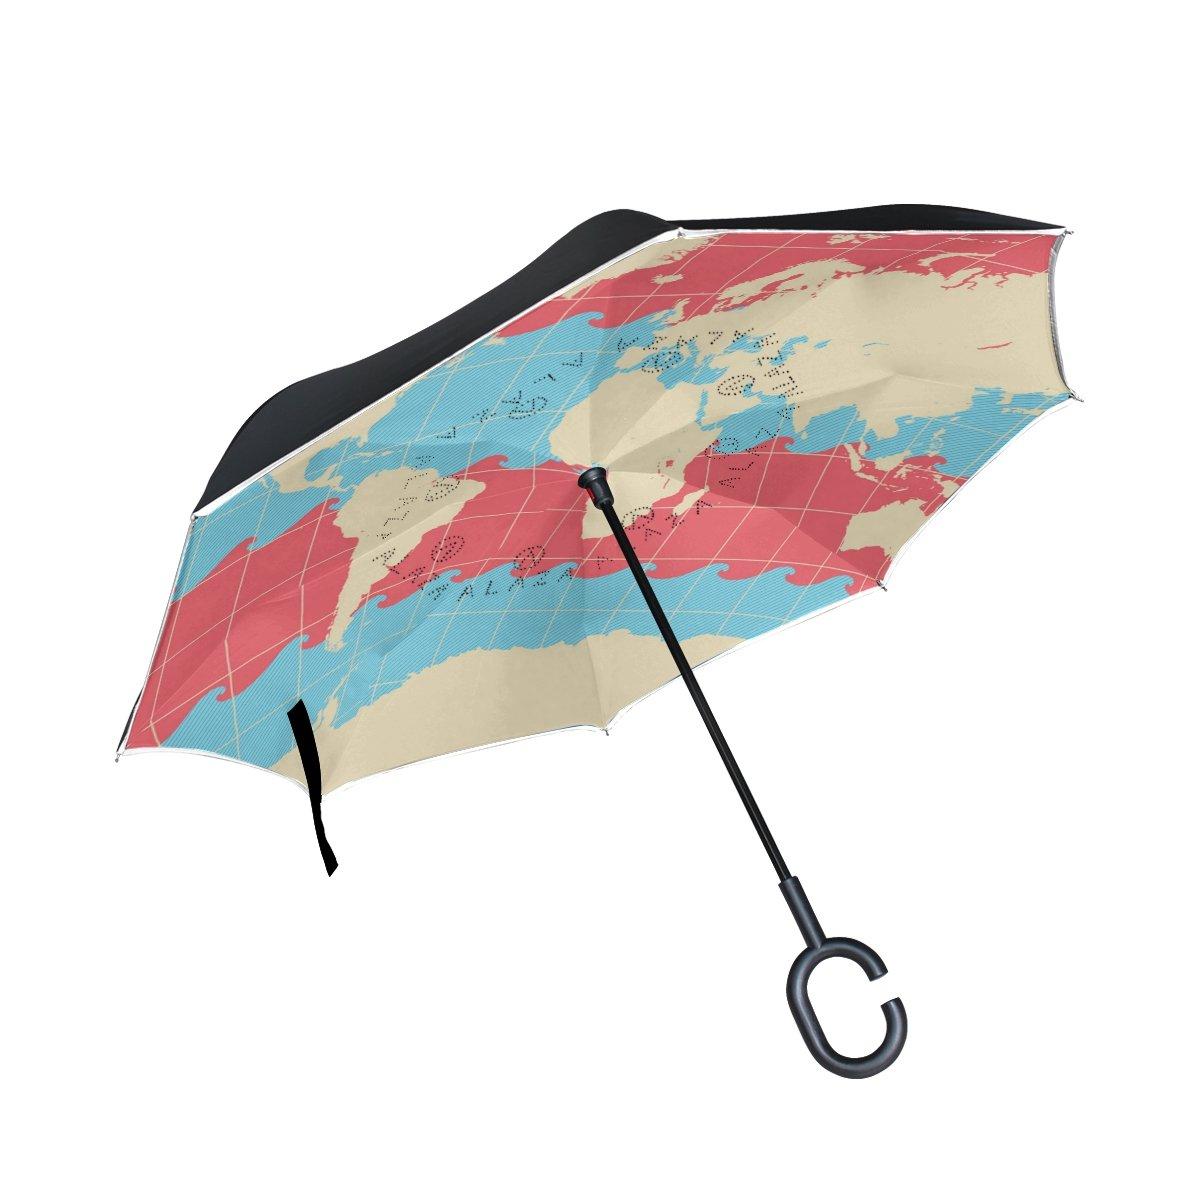 aideess Waveワールドマップパターン印刷車逆傘アウトドア、防風、UVプルーフReverse折り畳み傘C型の手フリーハンドル   B075R7967B